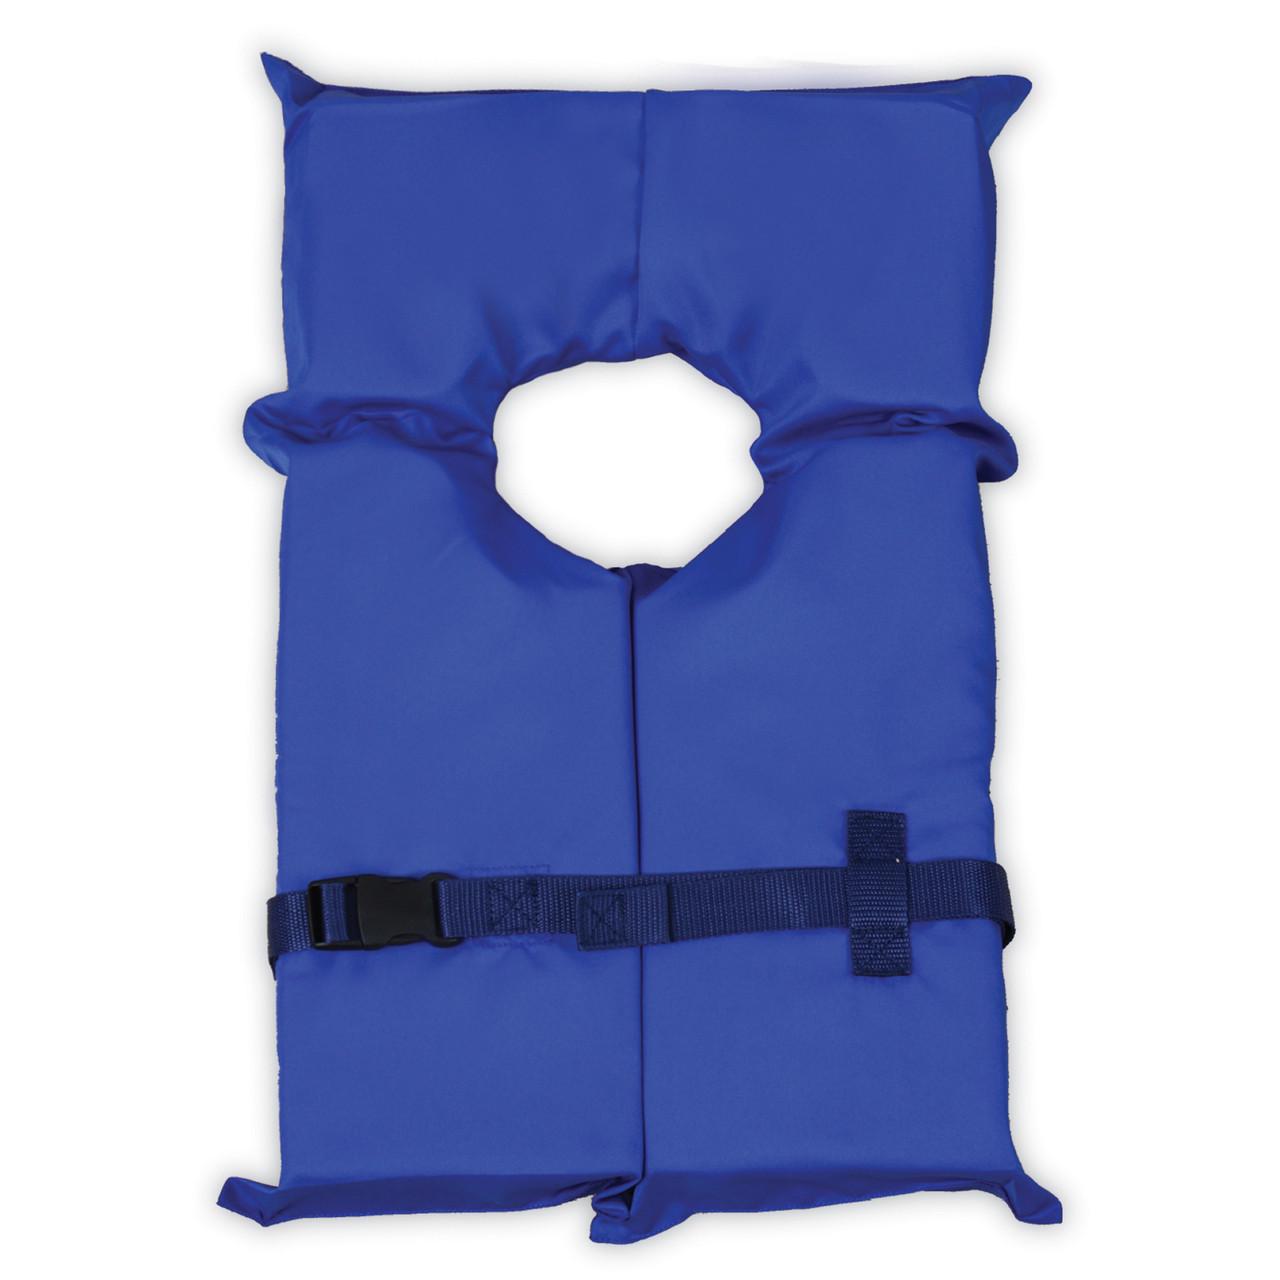 X2O Type II Life Vest, Blue